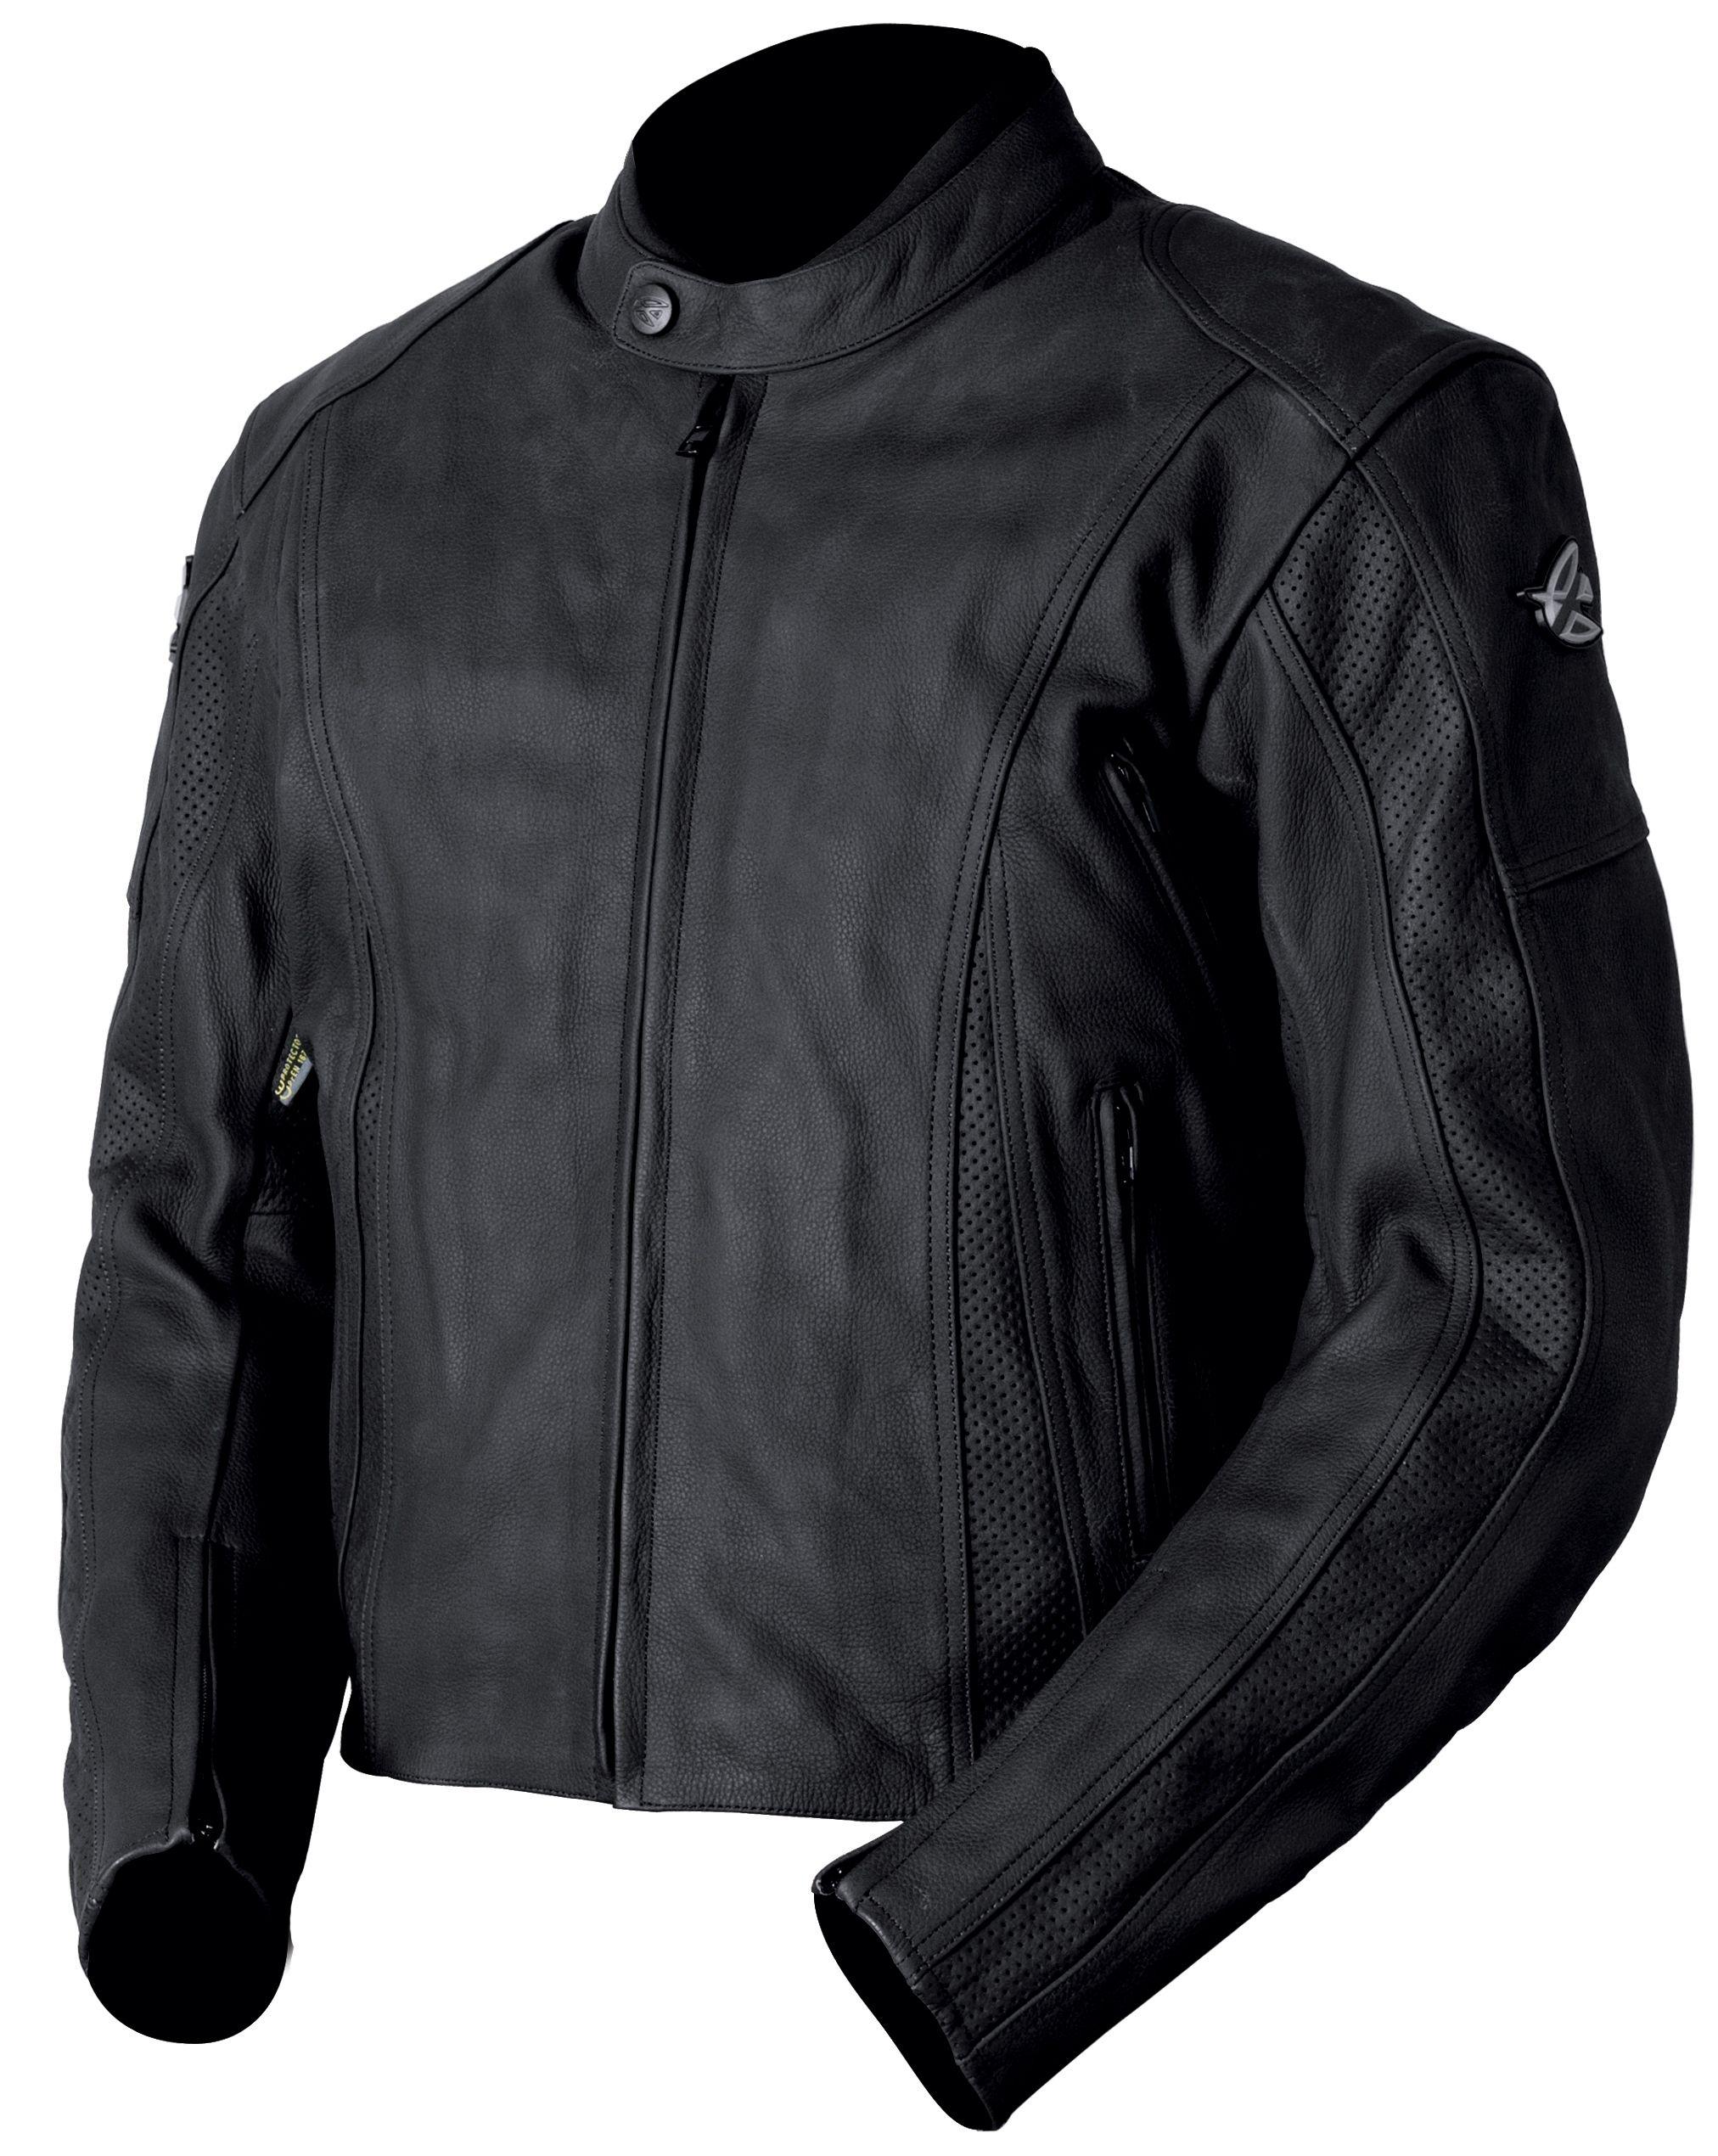 AGVSPORT Canyon Perforated (Black) Leather Jacket